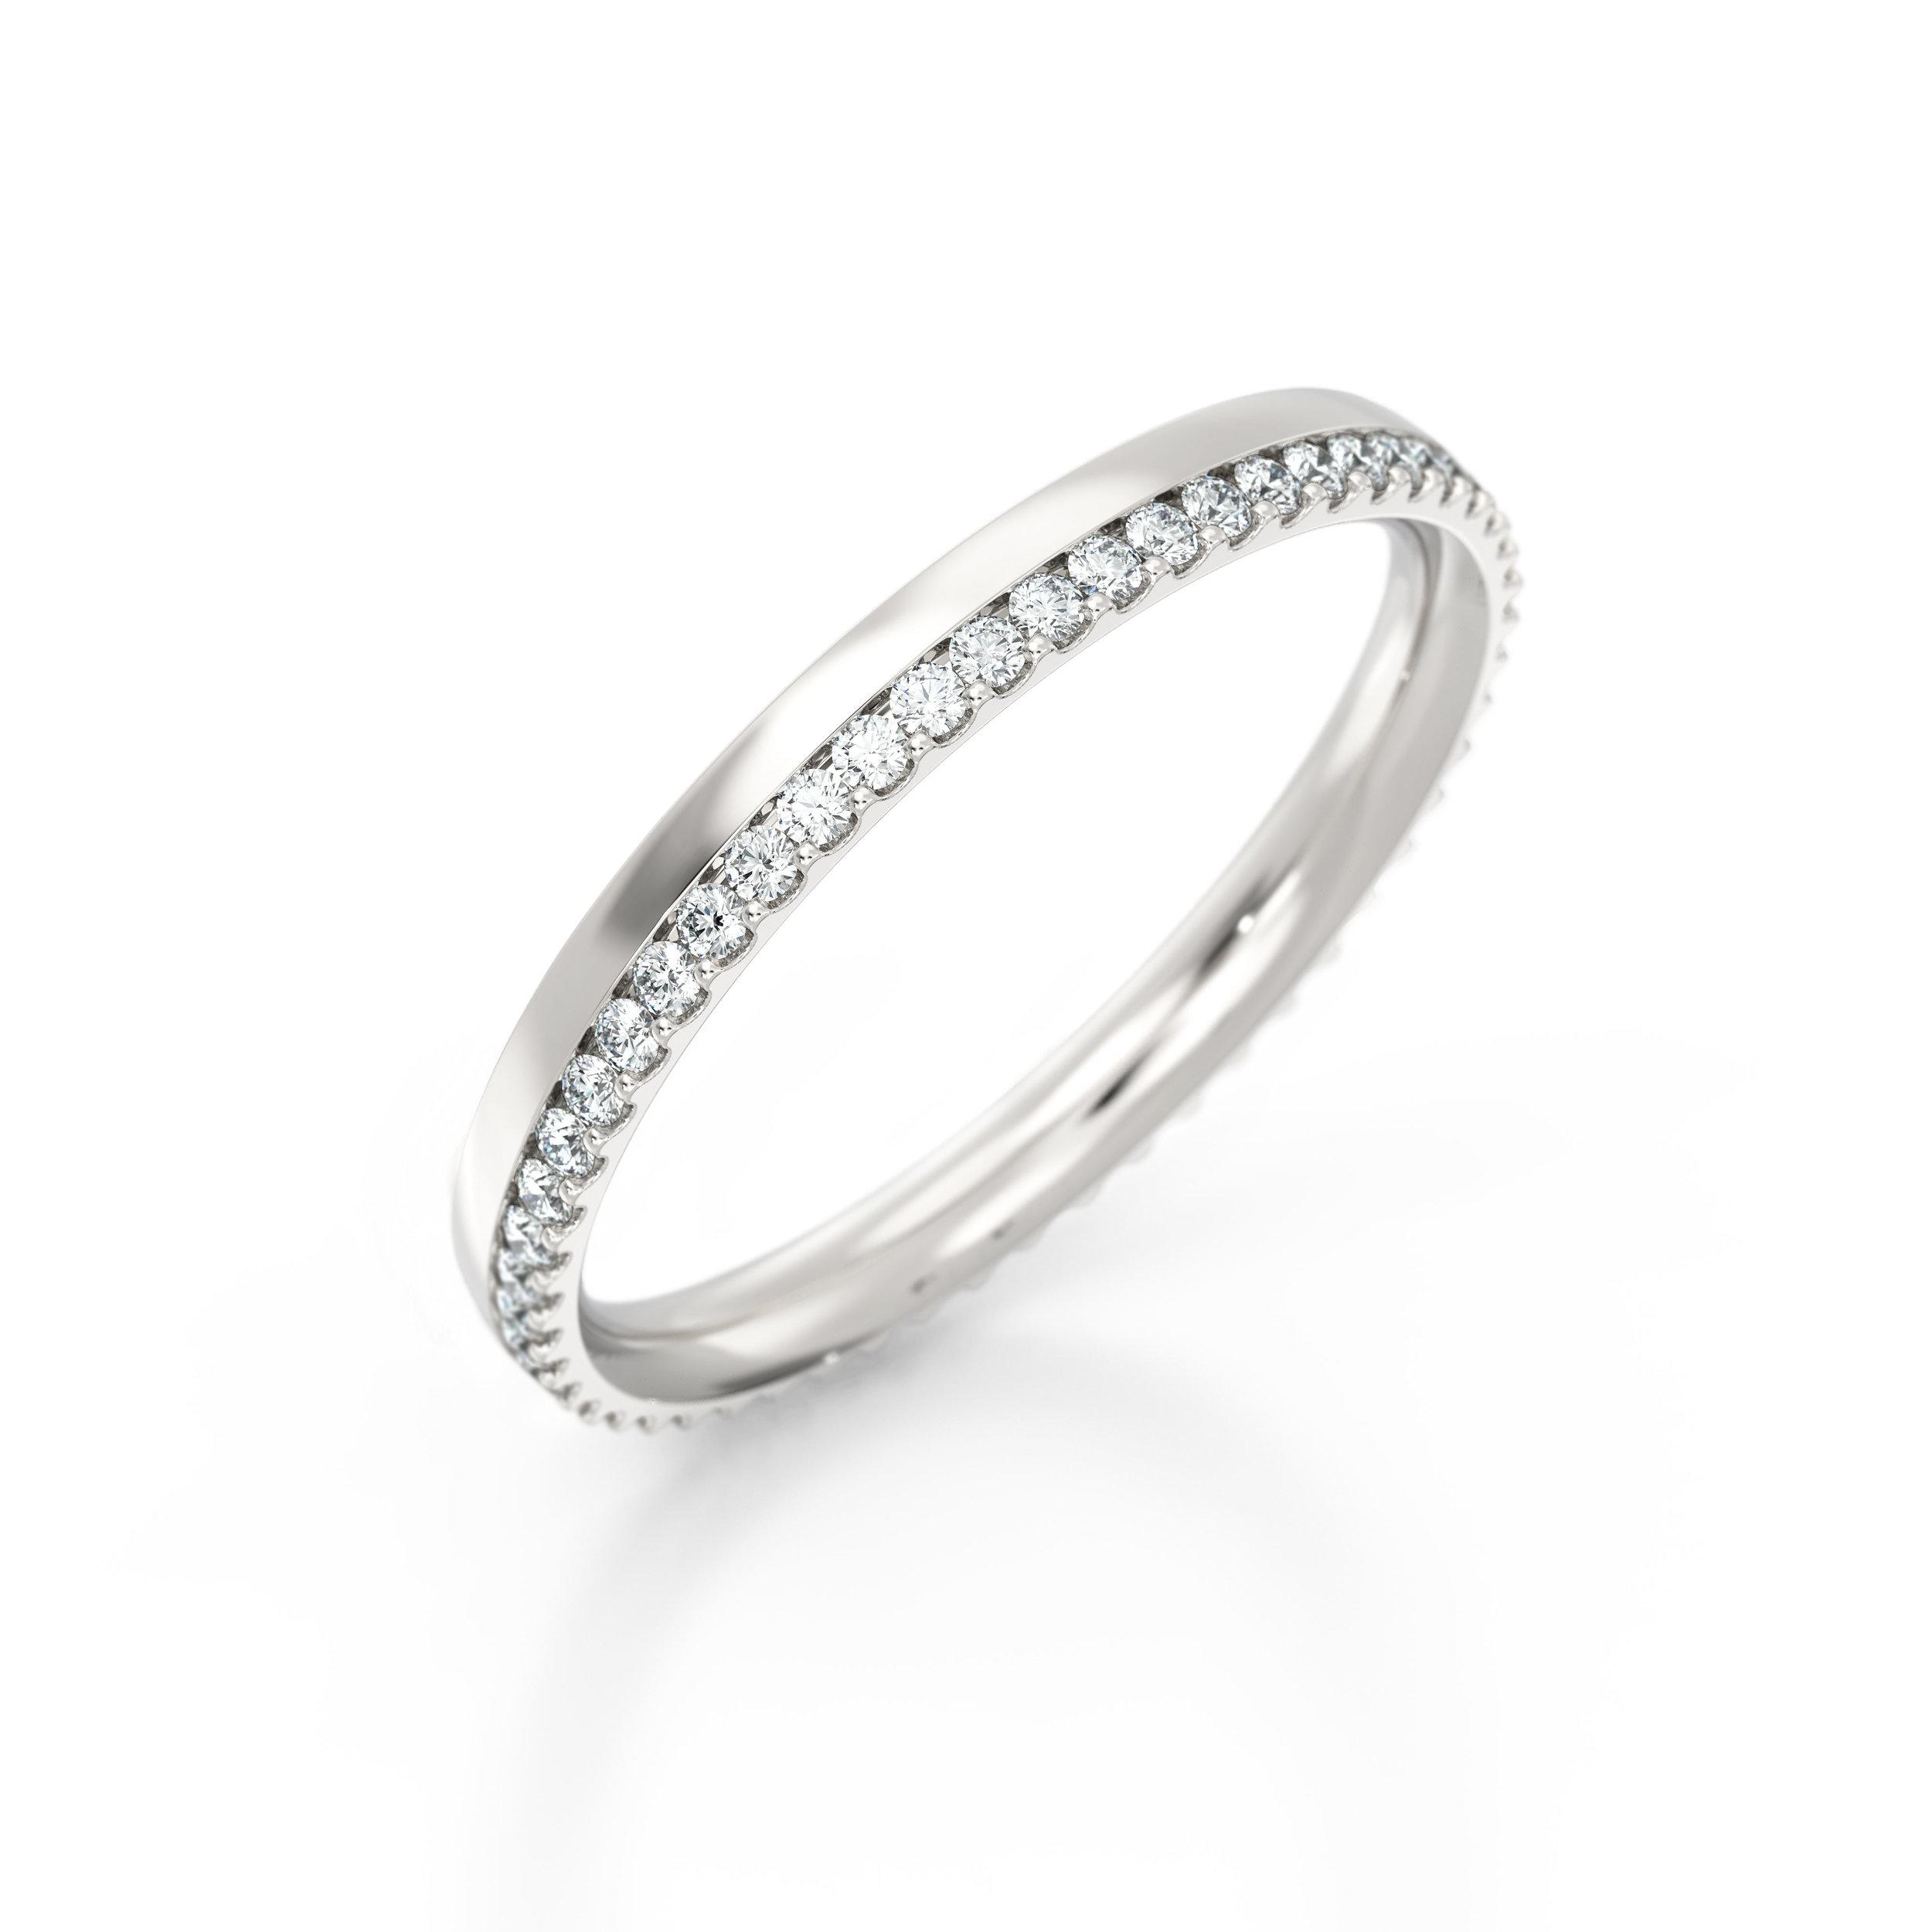 Off-set shared claw diamond eternity ring   Hatton Garden